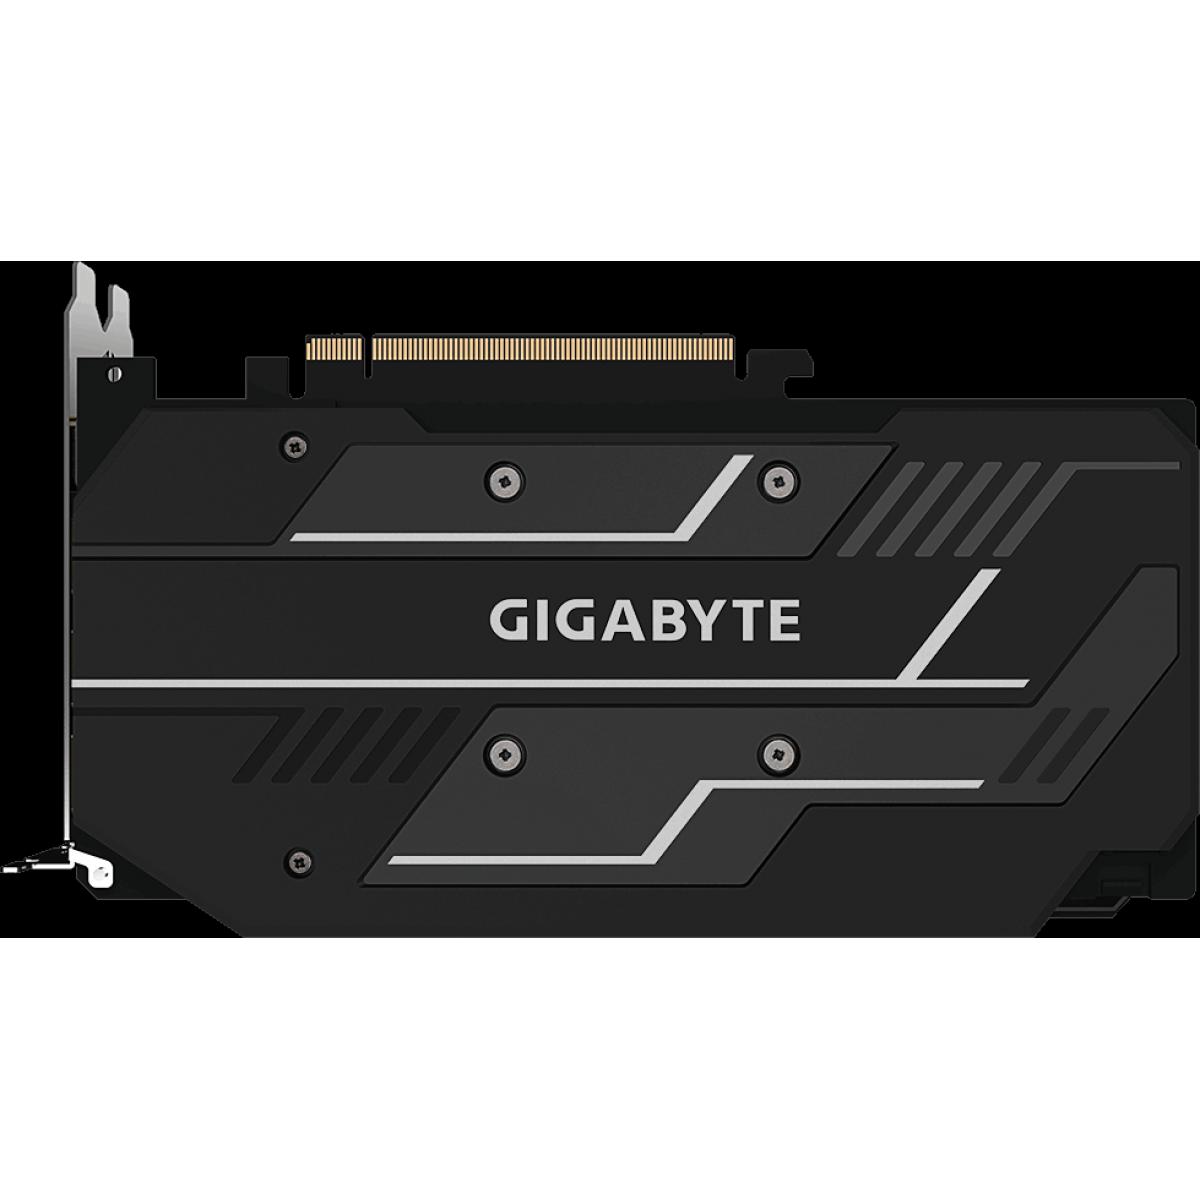 Placa de Vídeo Gigabyte Radeon RX 5500 XT OC, 4GB GDDR6, 128Bit